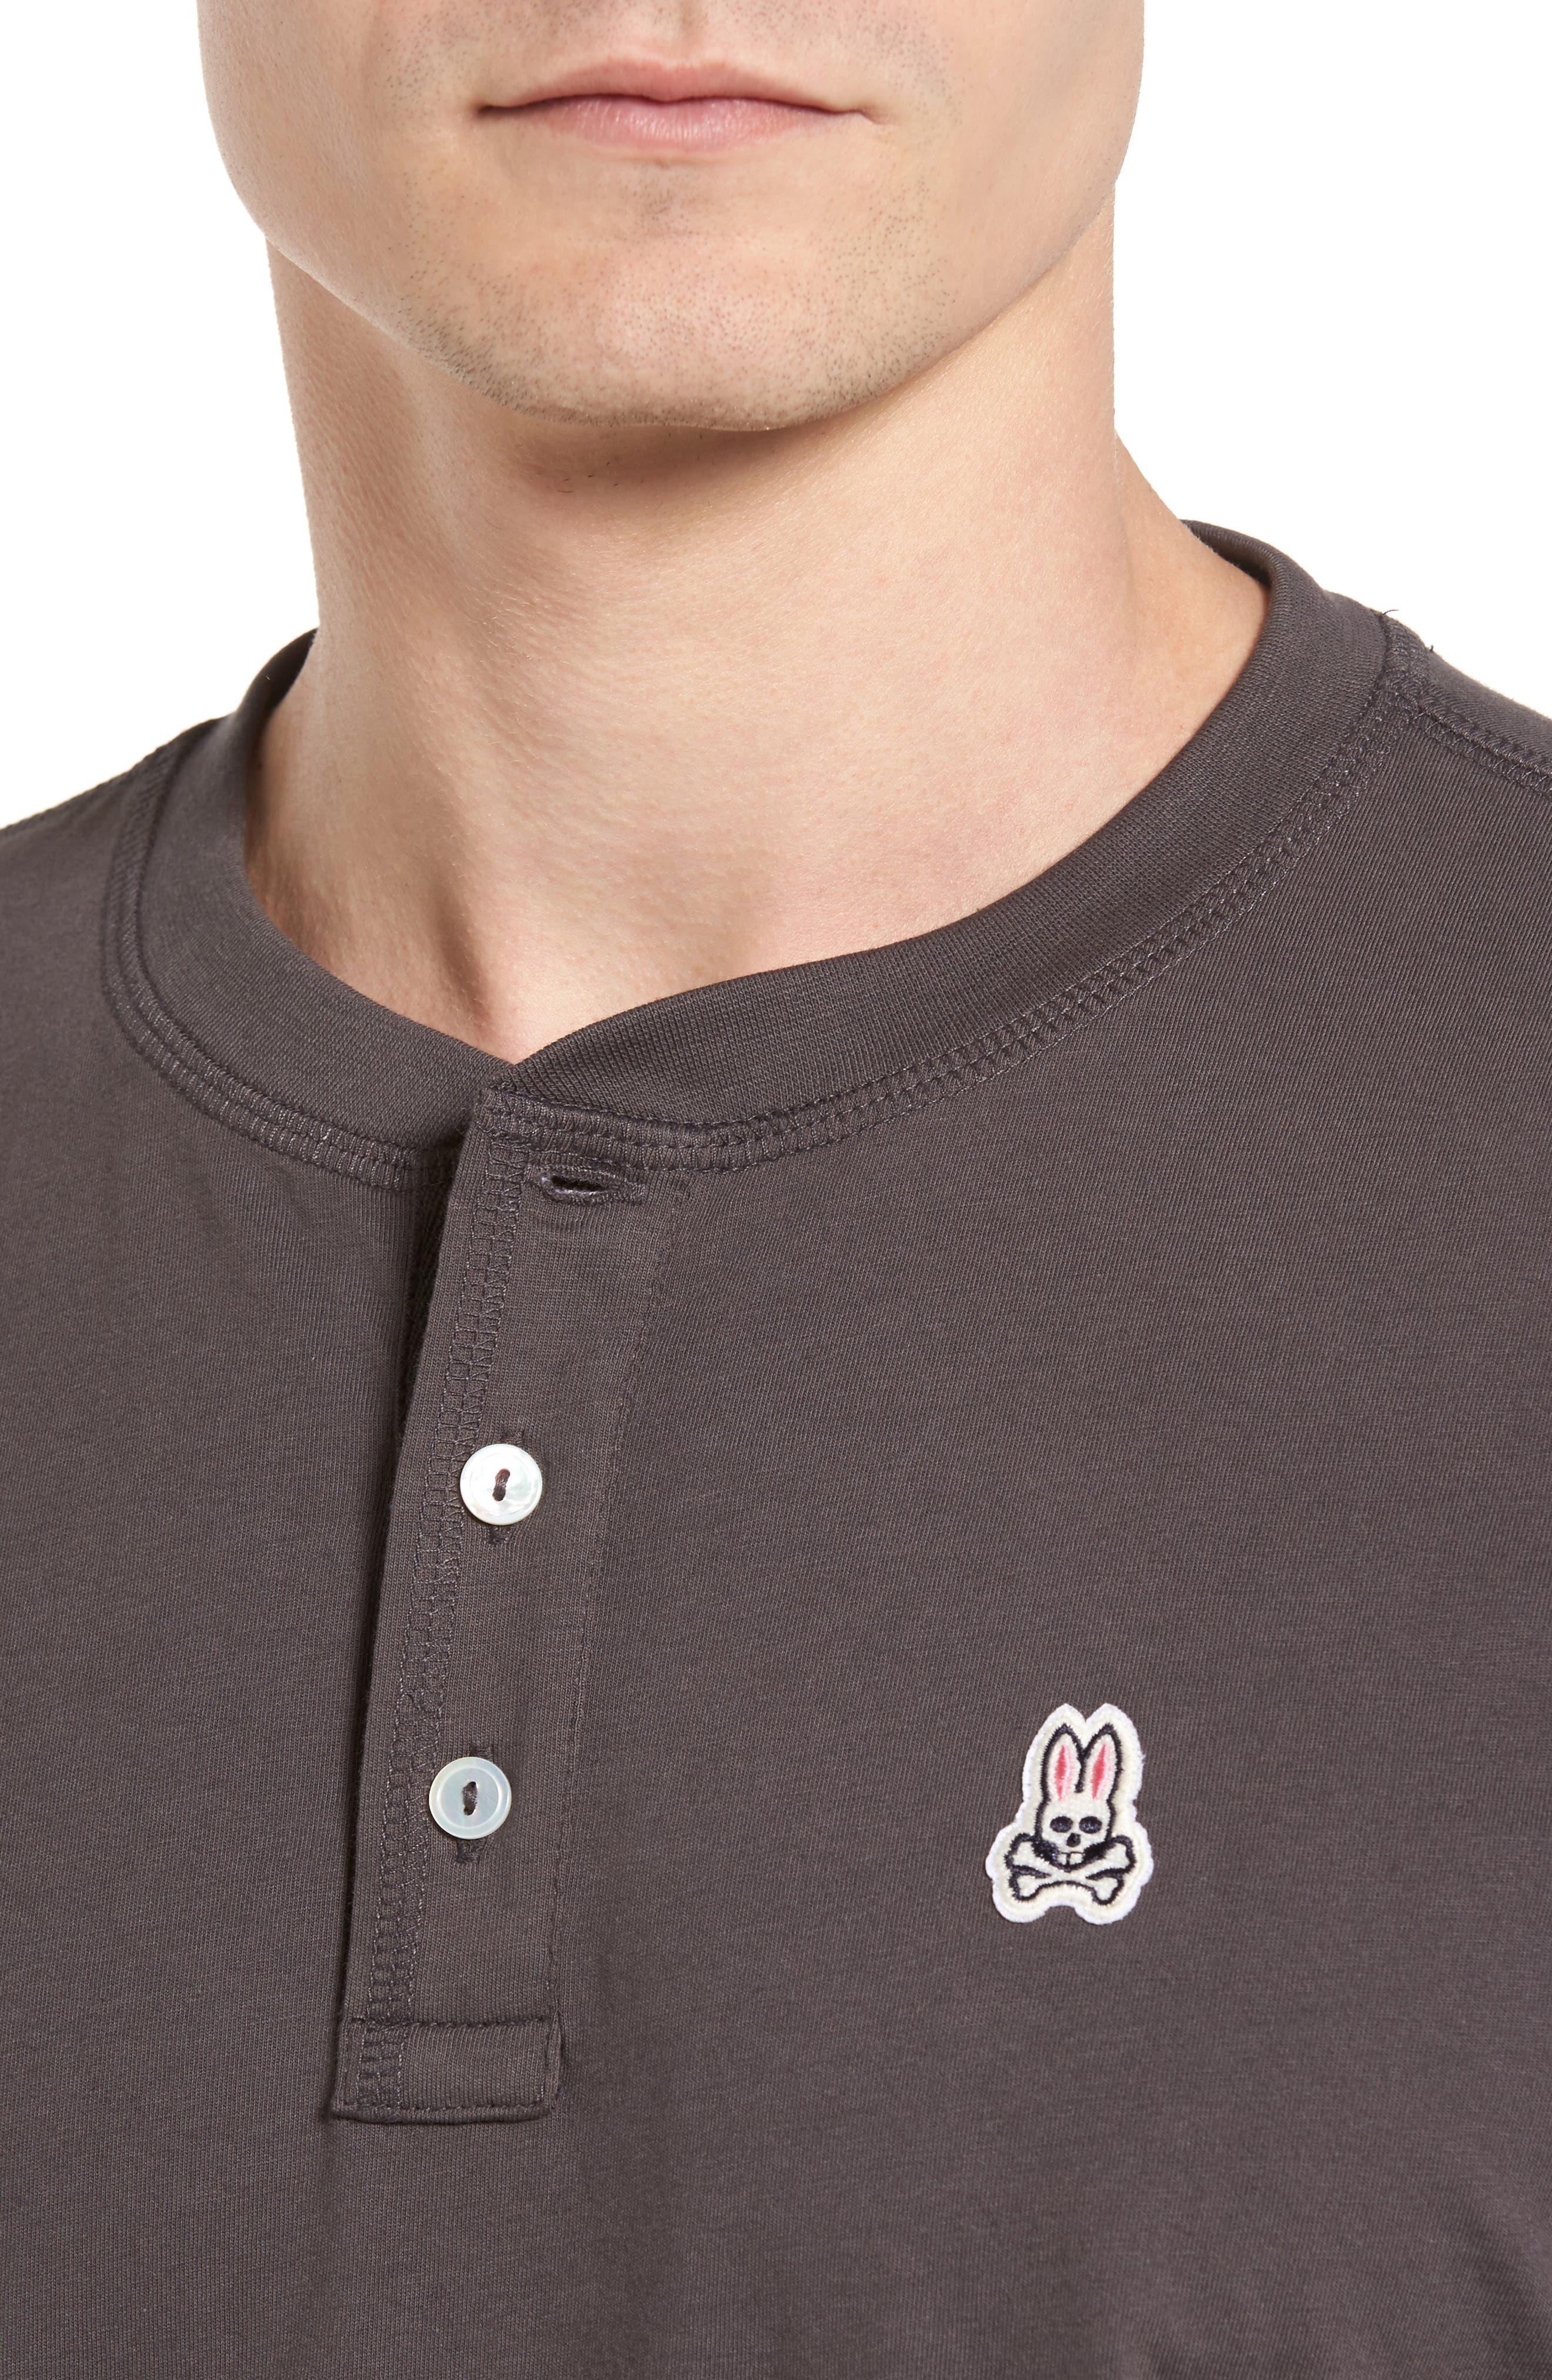 Henley T-Shirt,                             Alternate thumbnail 4, color,                             003